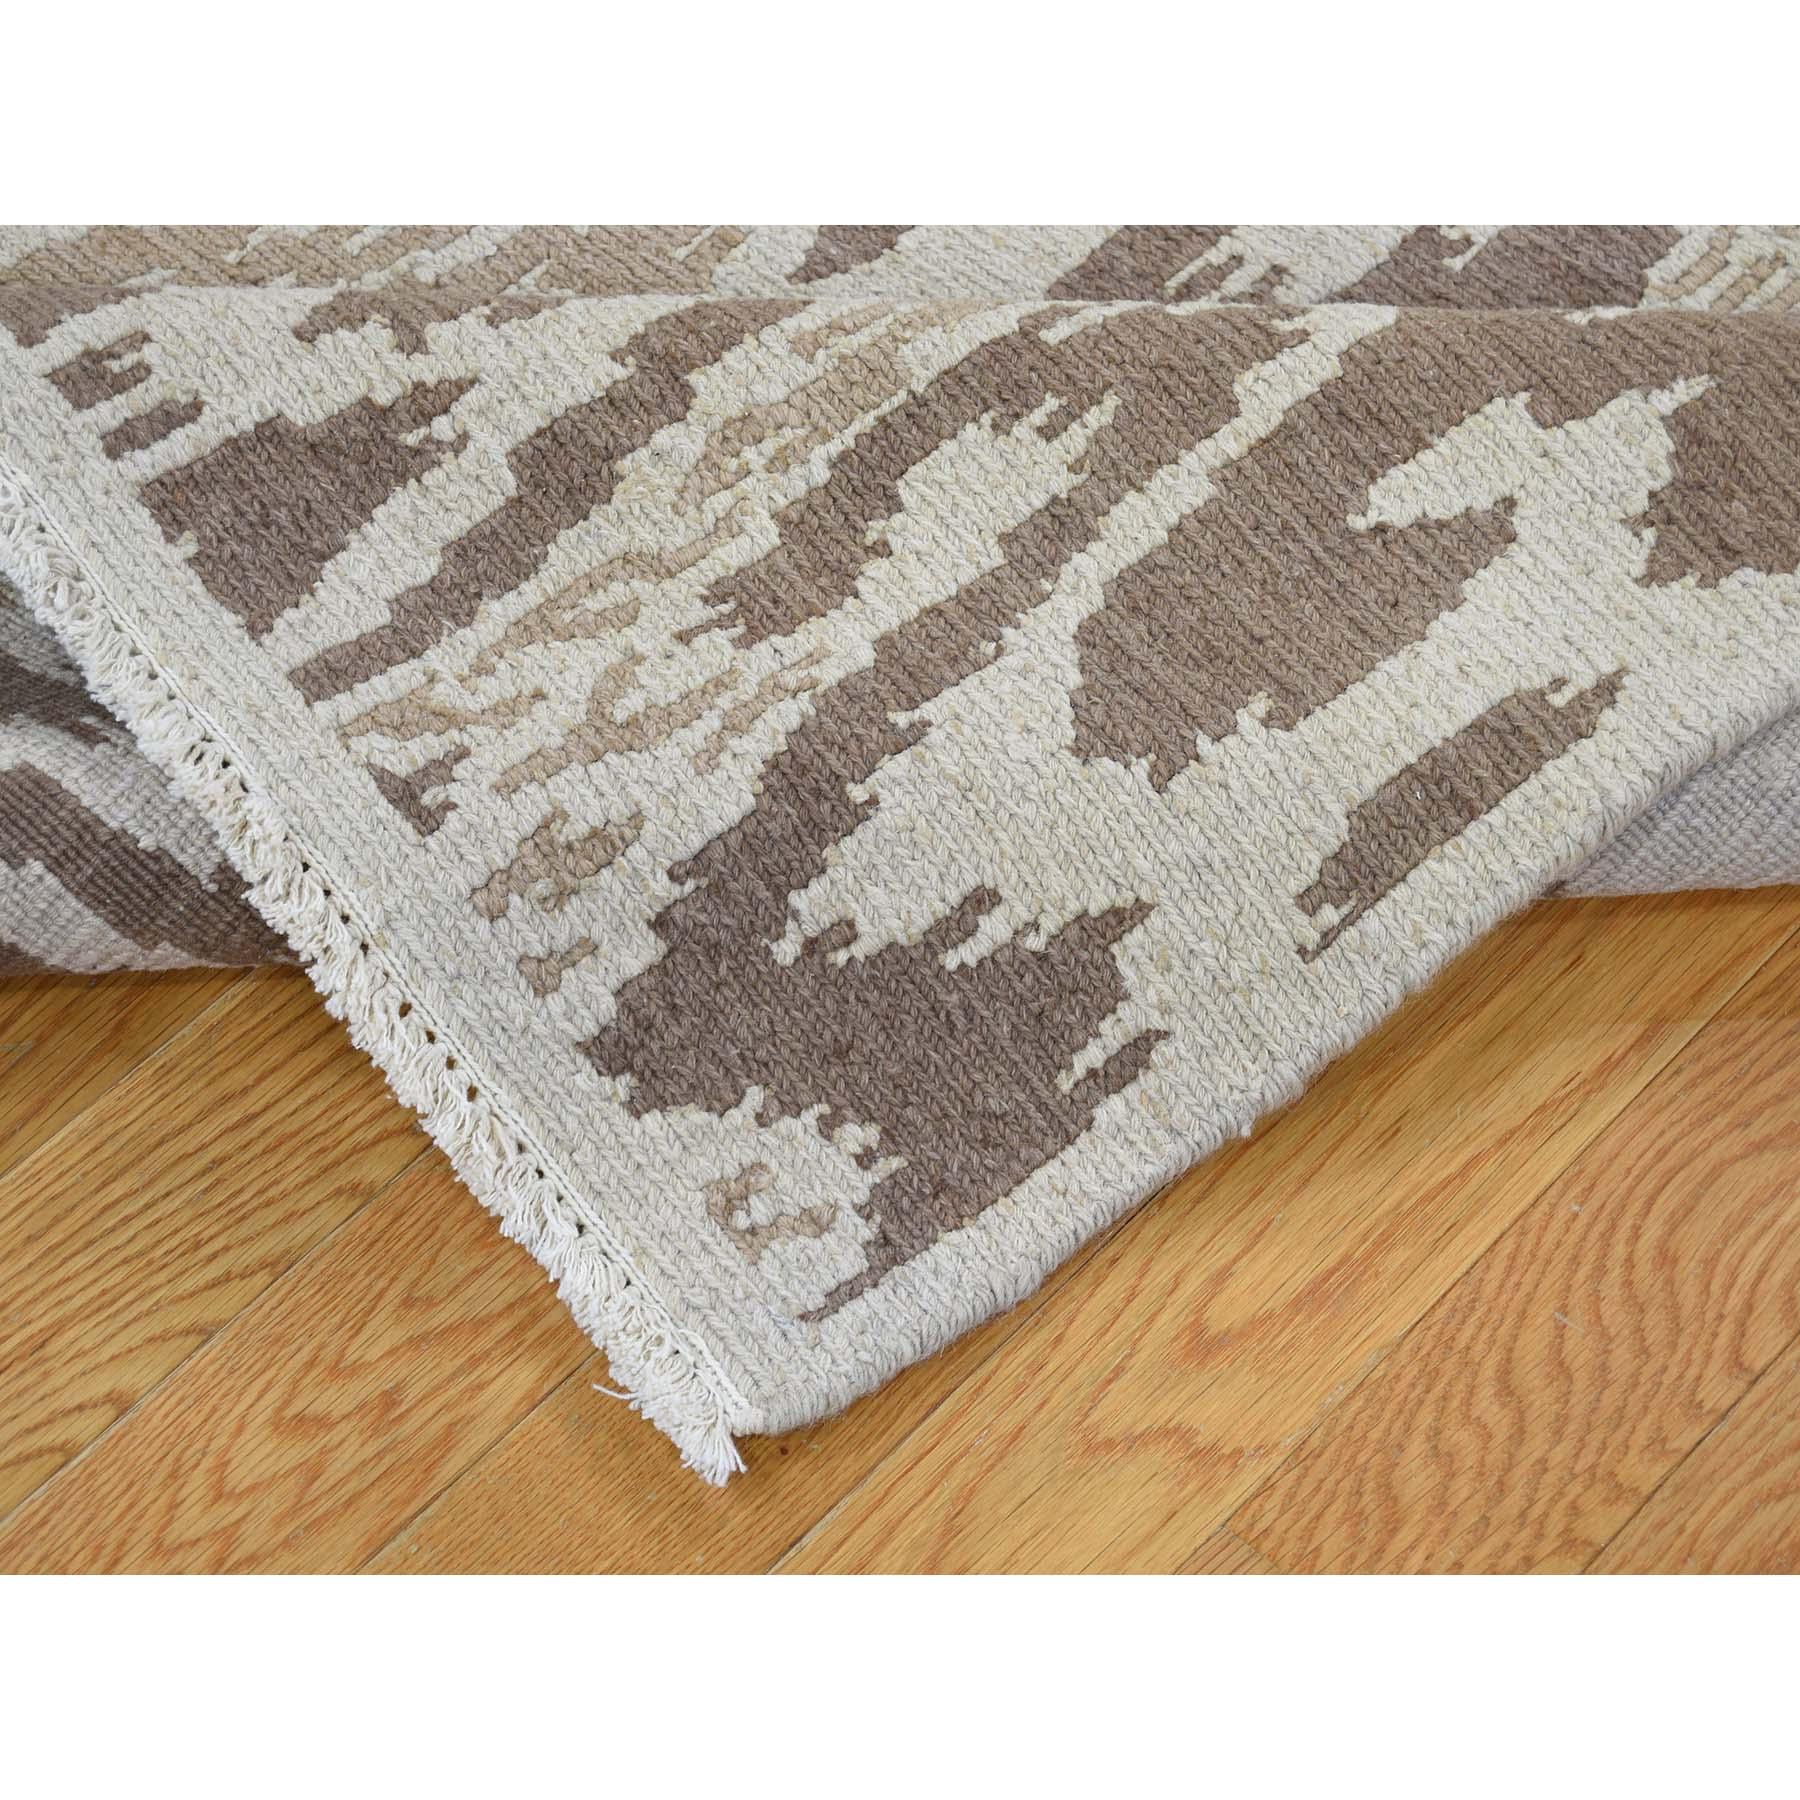 5-x6-9  Soumak with Ikat Design Flat Weave Hand Woven Pure Wool Oriental Rug